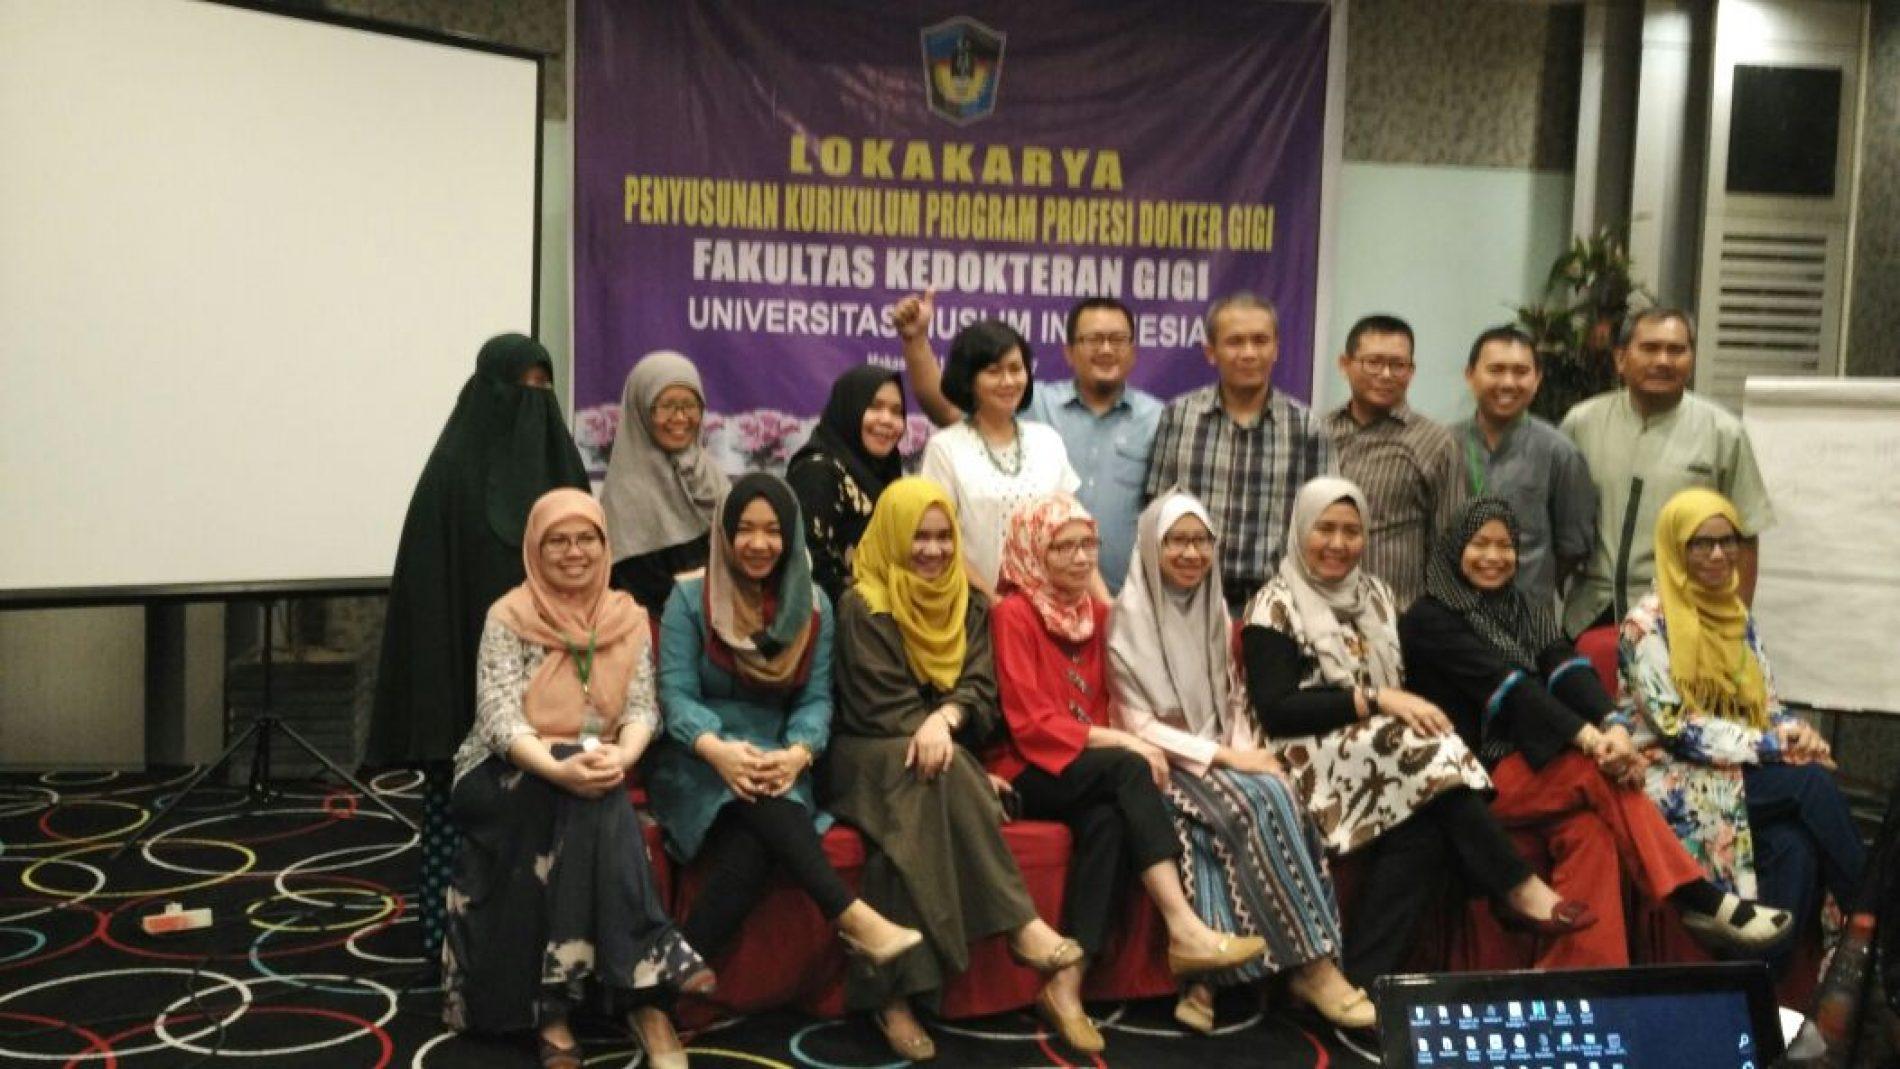 Lokakarya penyusunan kurikulum profesi dokter gigi 11-12 Maret 2017